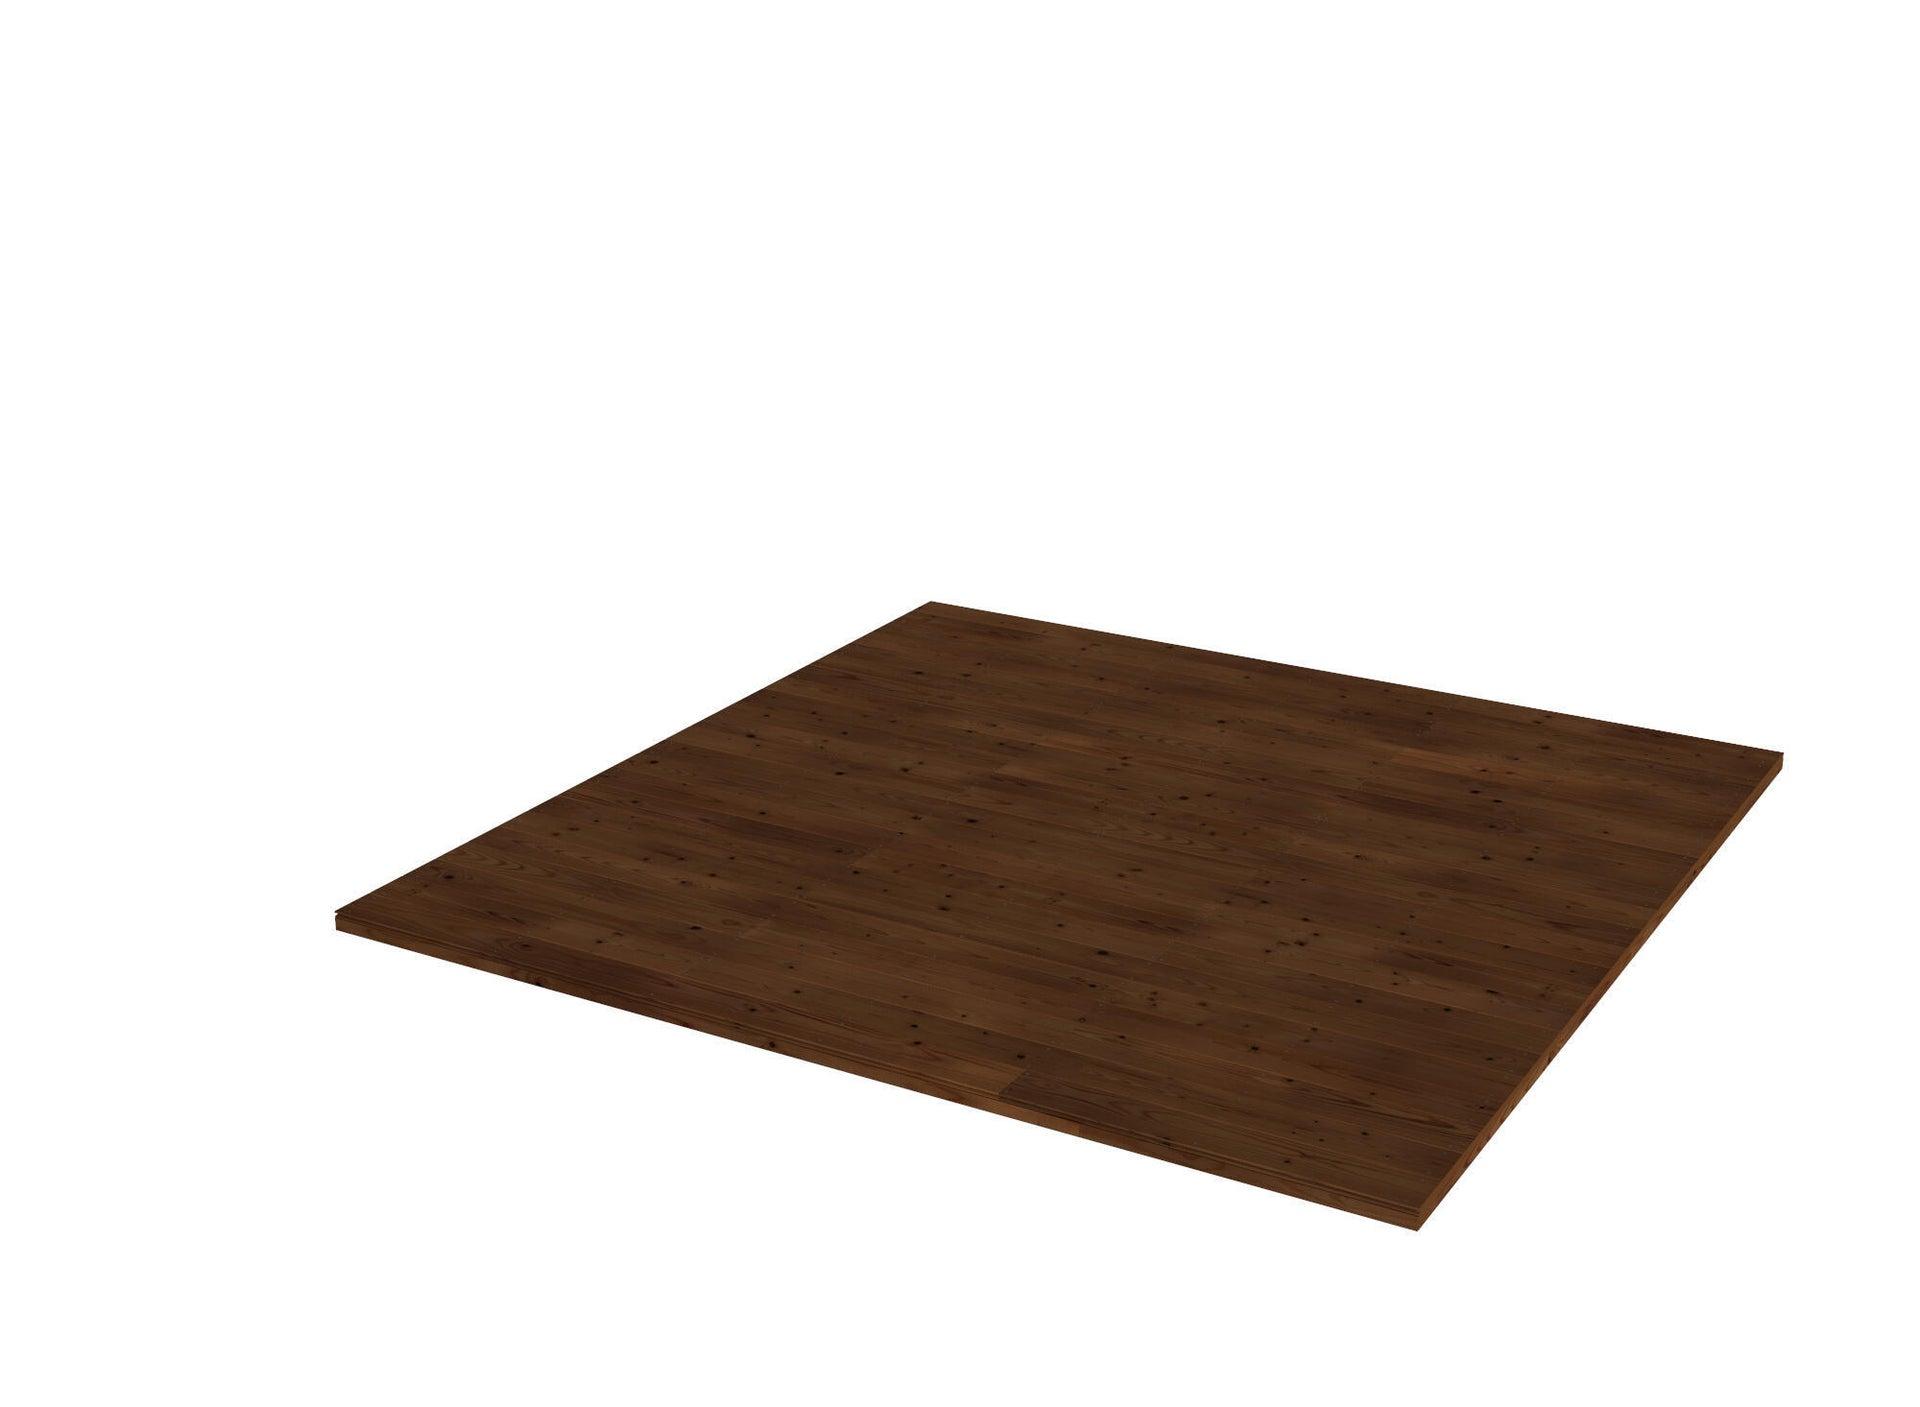 Pavimento per casetta da giardino Viola DECOR ET JARDIN 241.4 x 250 x 45 cm - 4